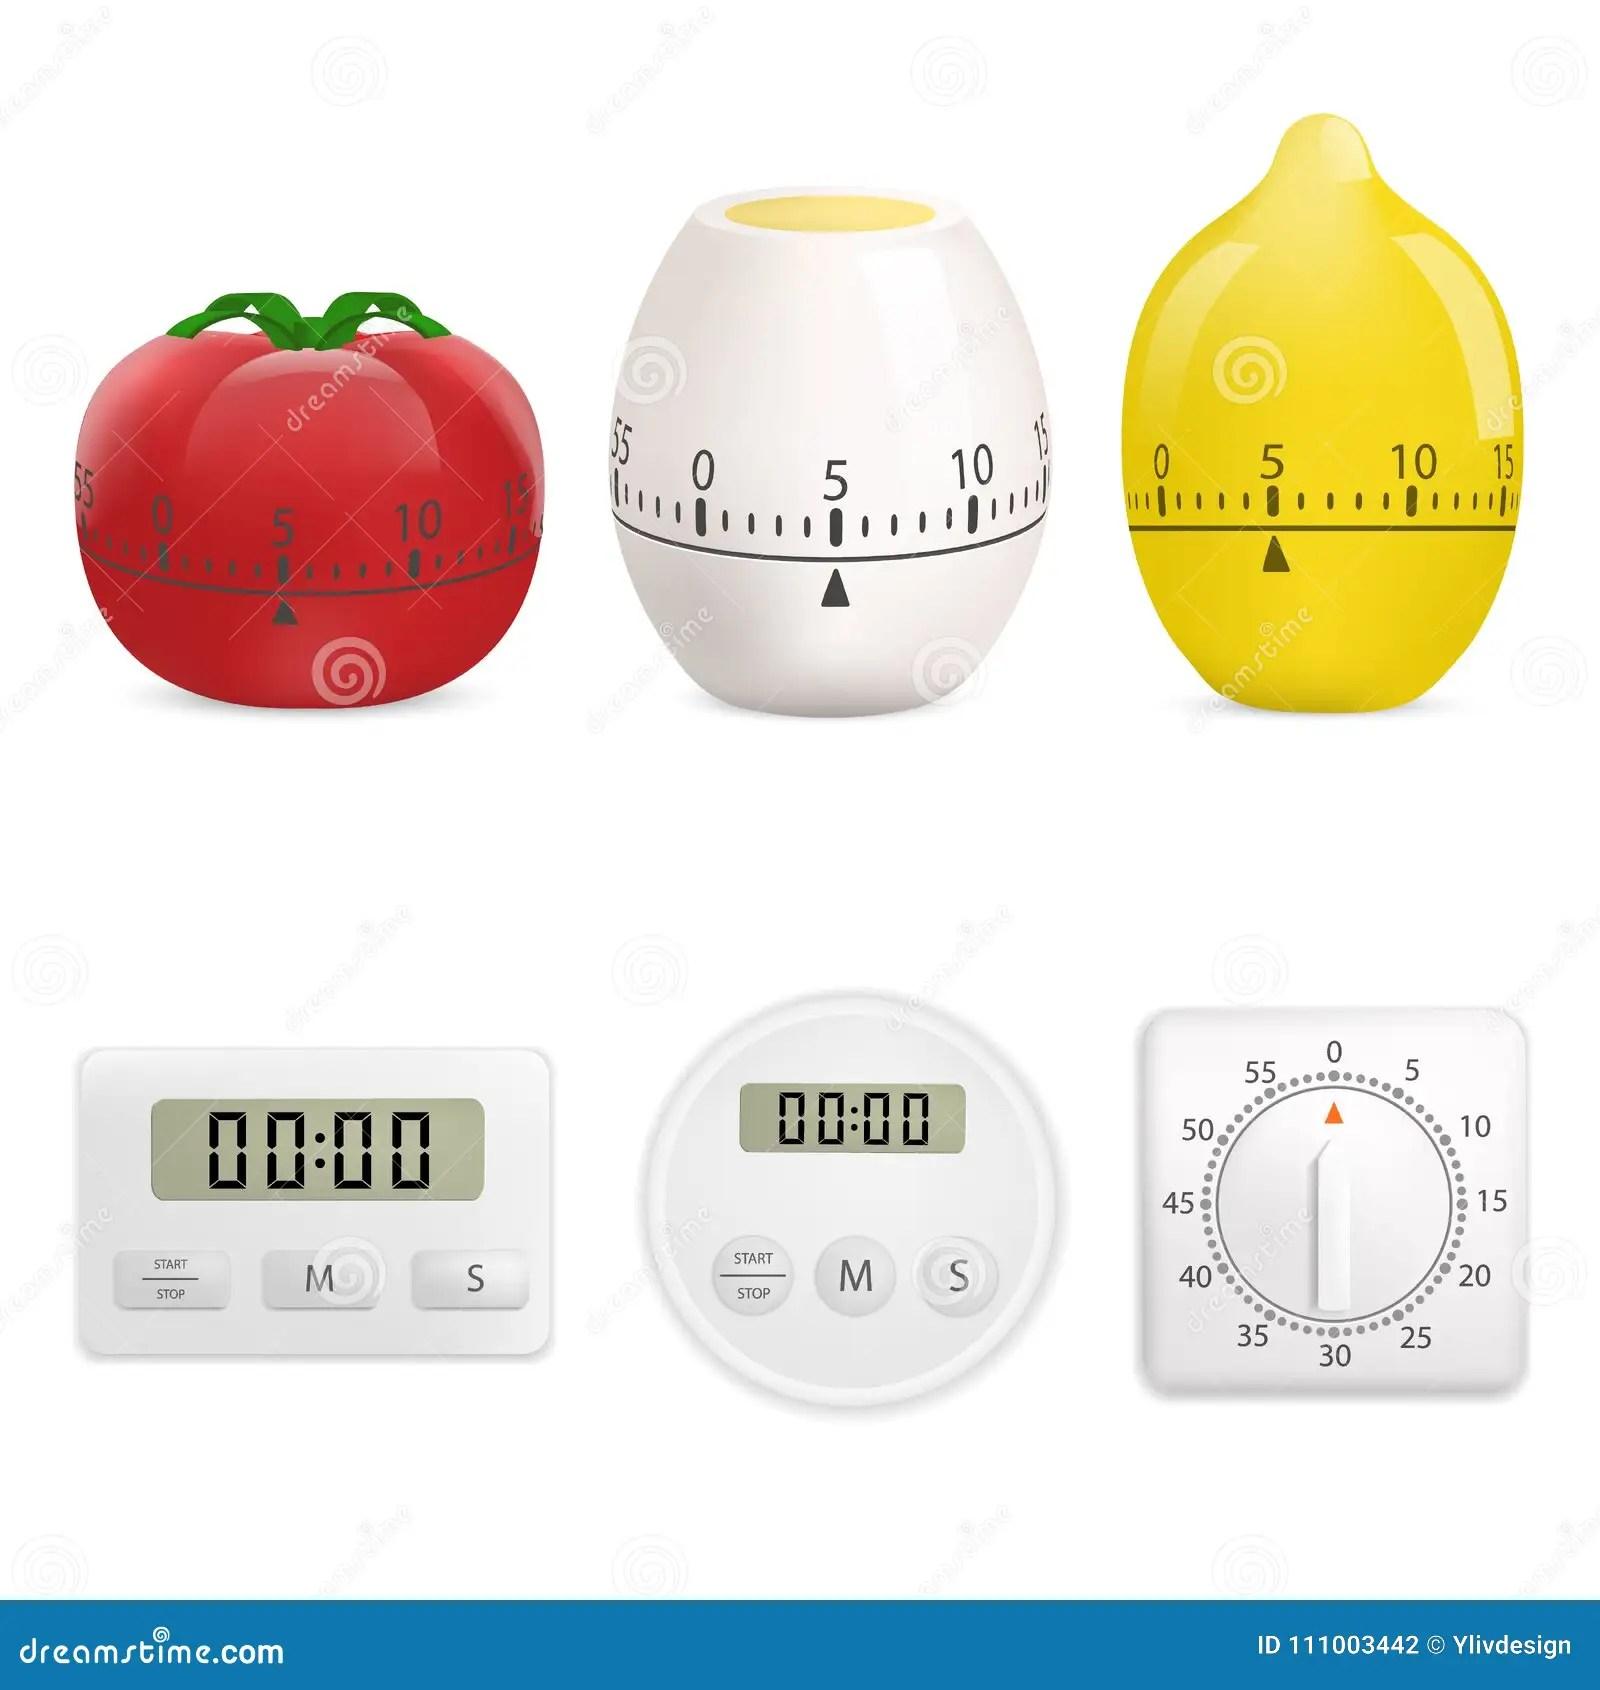 kitchen timers stainless faucet 厨房定时器大模型集合 现实样式向量例证 插画包括有空白的 红色 嘲笑 现实样式